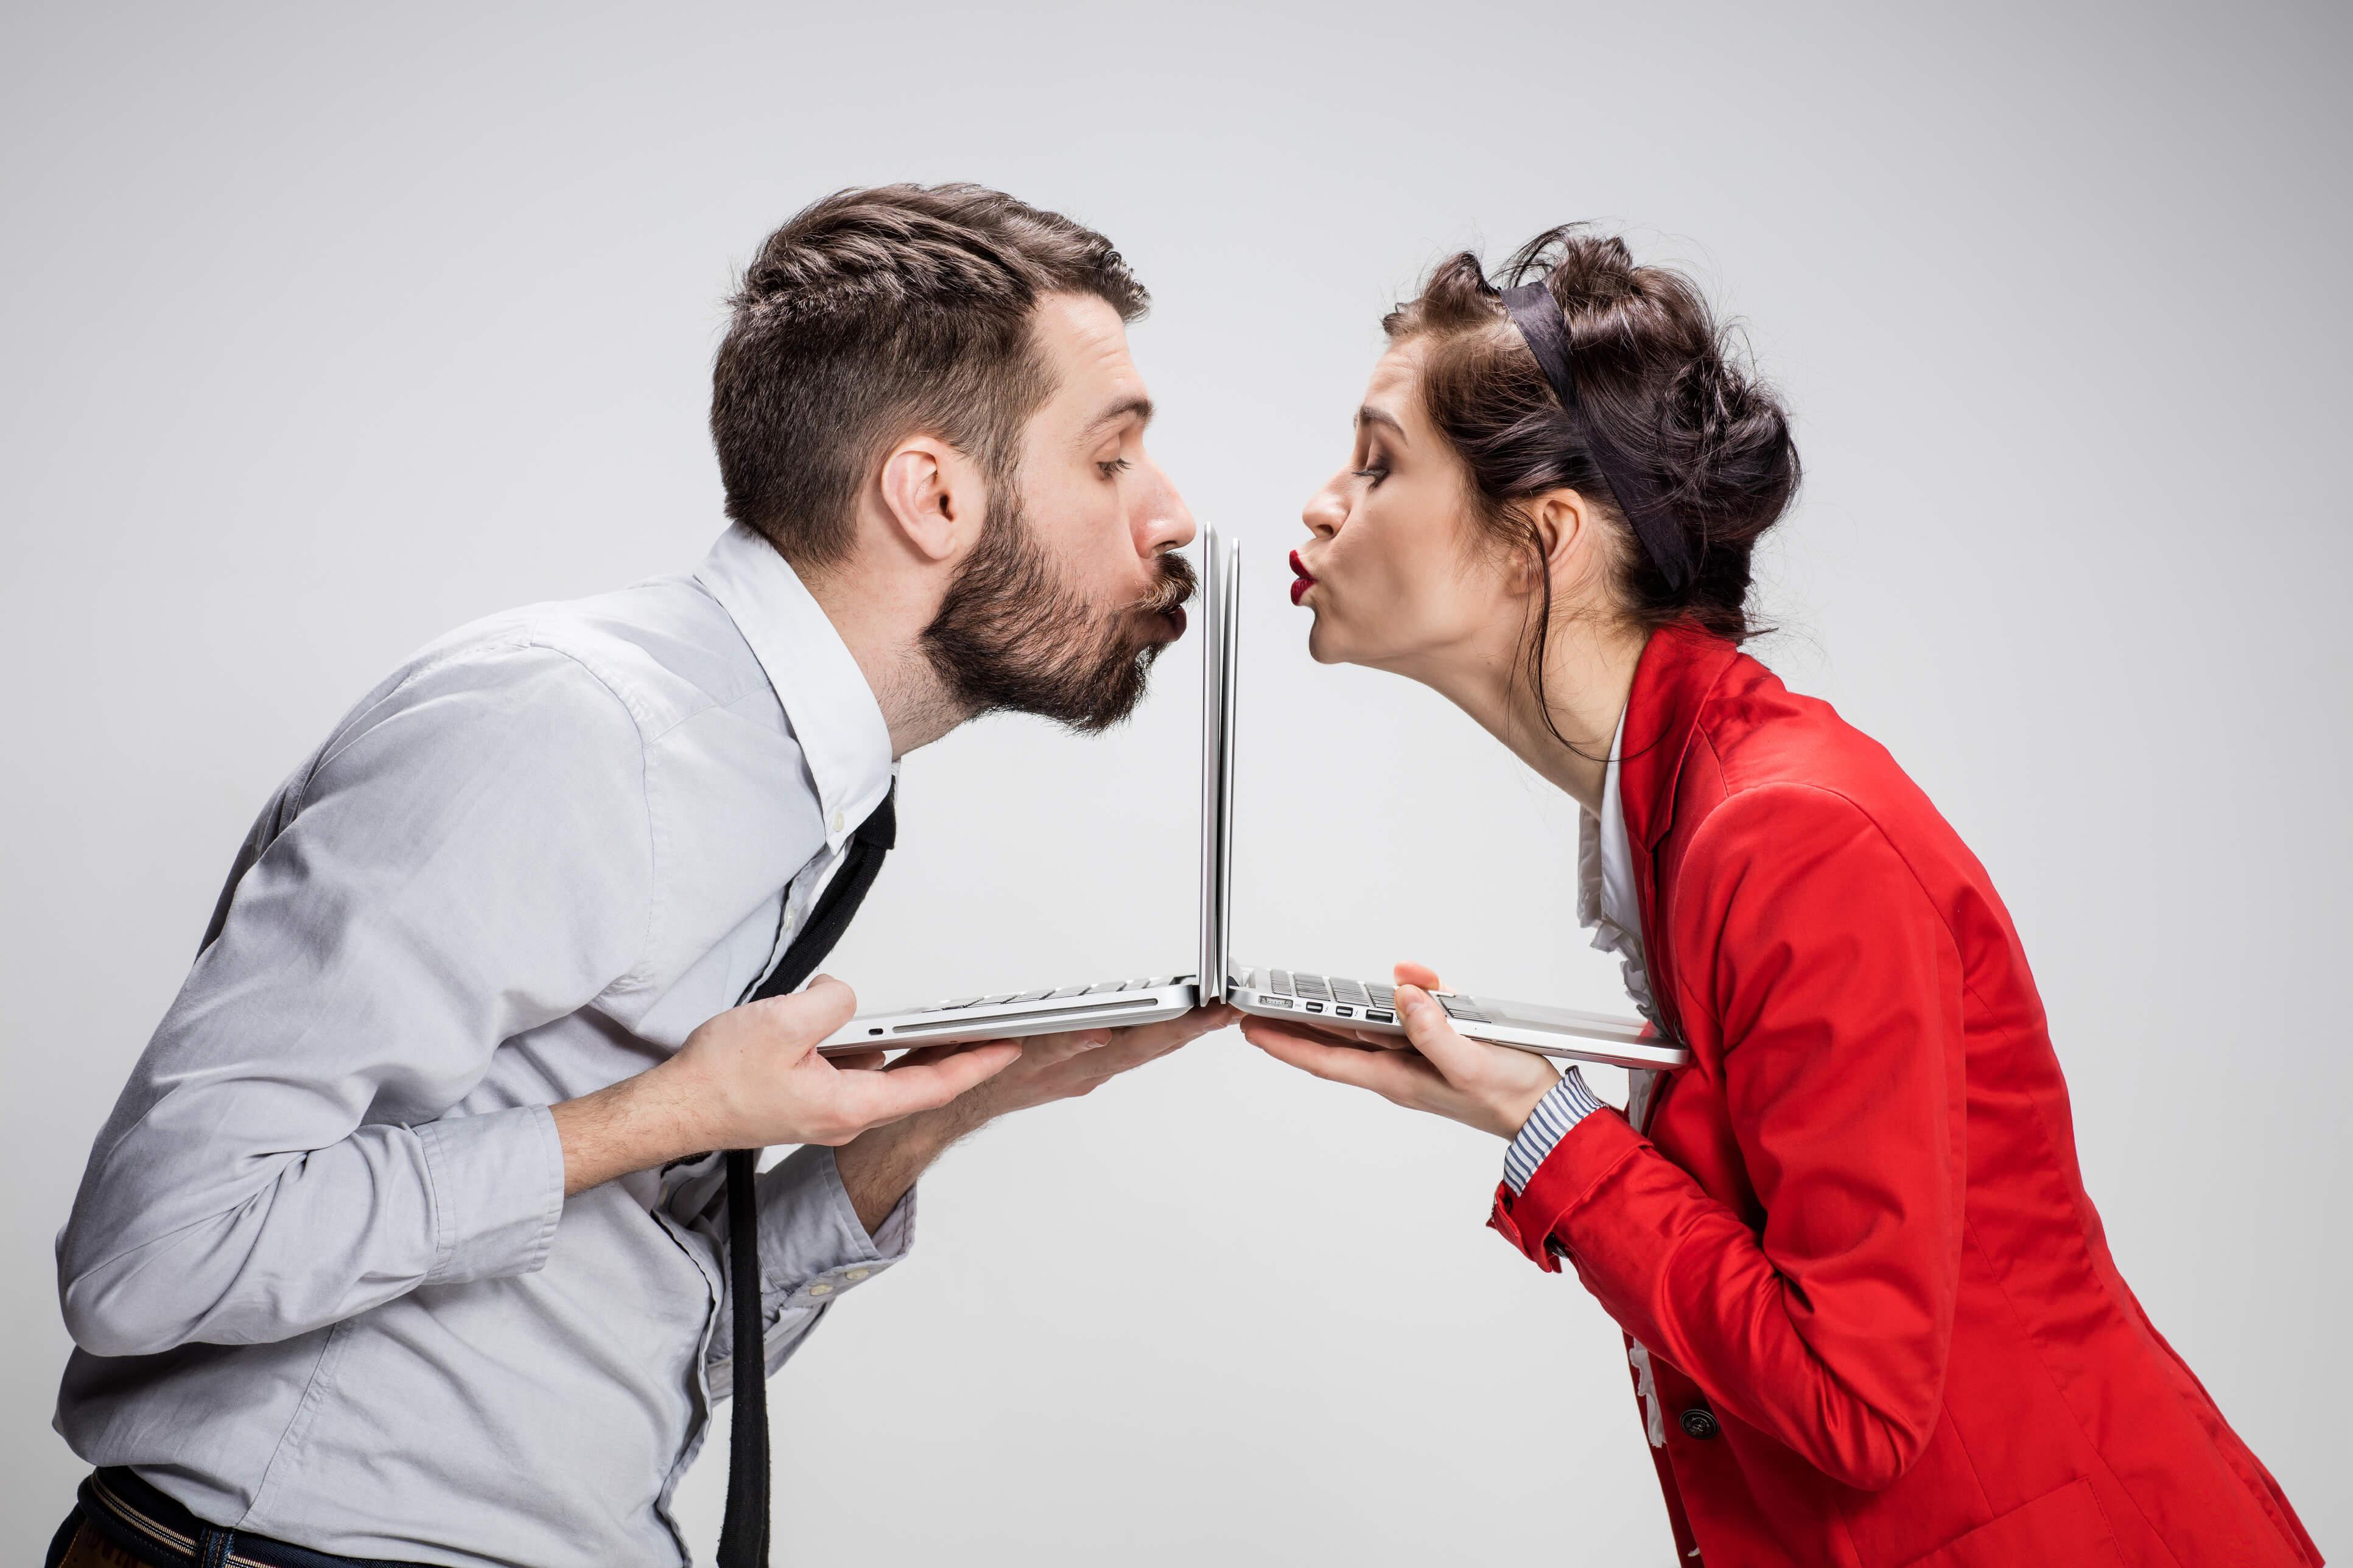 asiatisk dating danmark